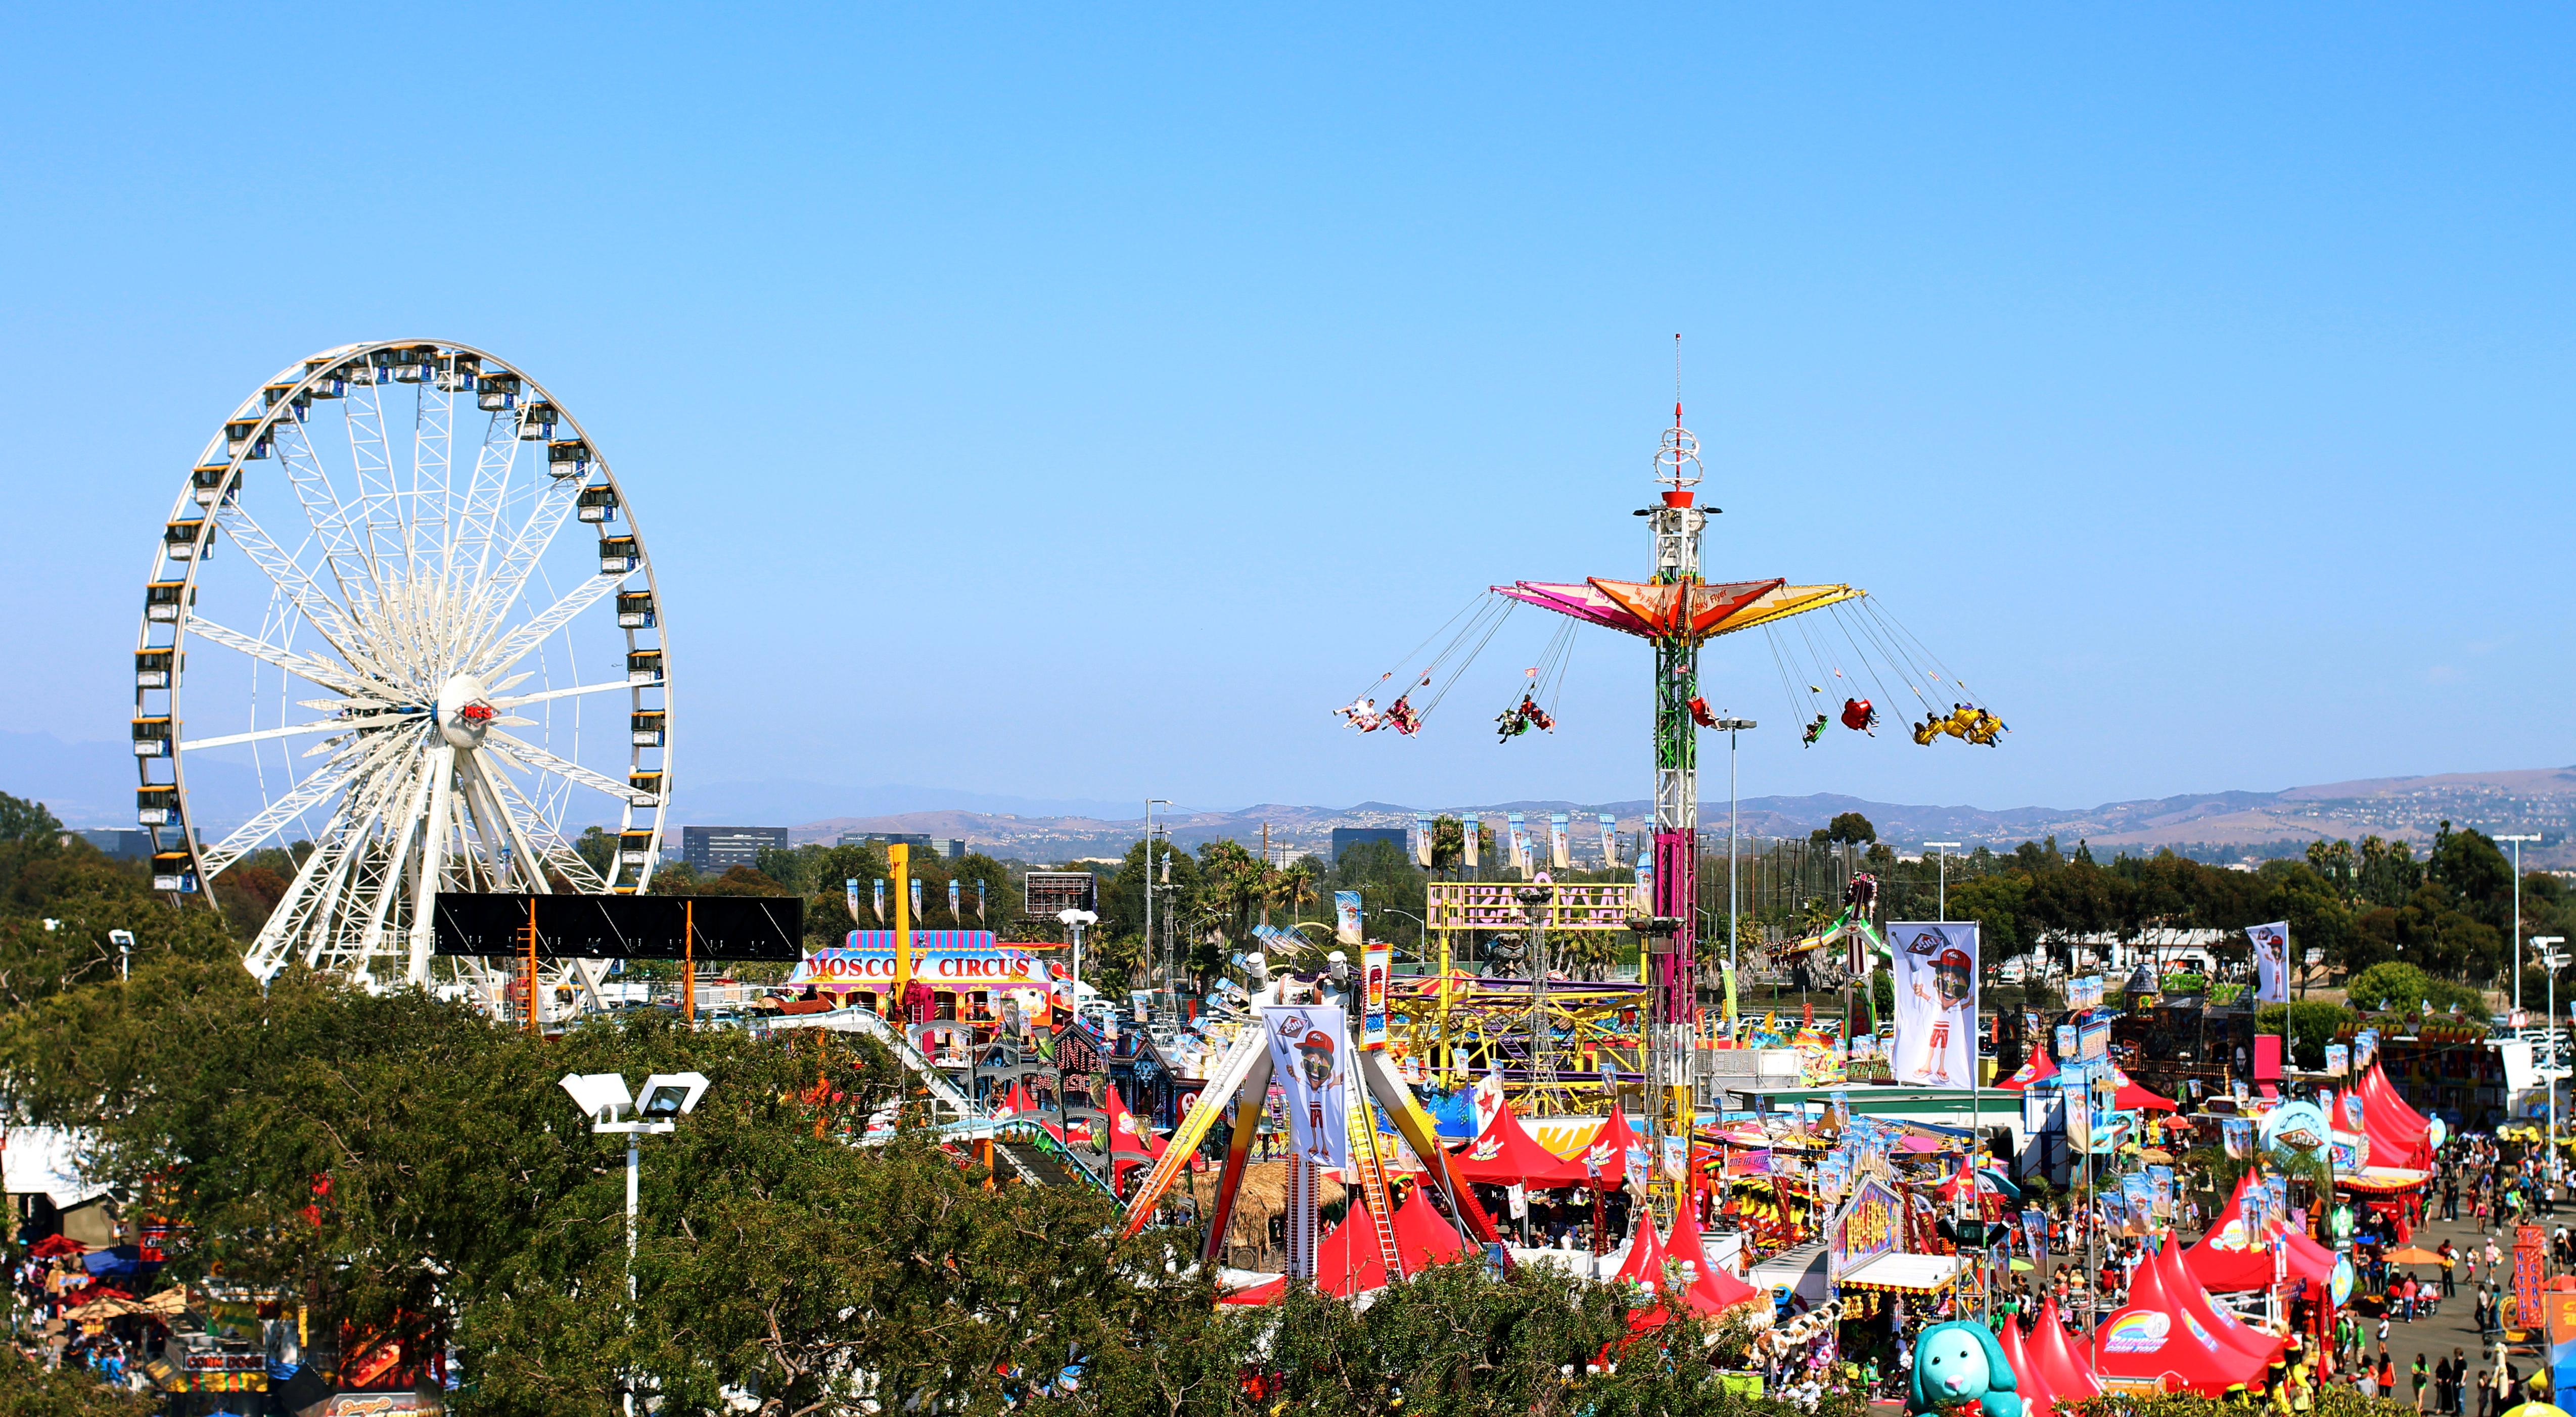 OC Fair, Costa Mesa, CA, Jul 13–Aug 12